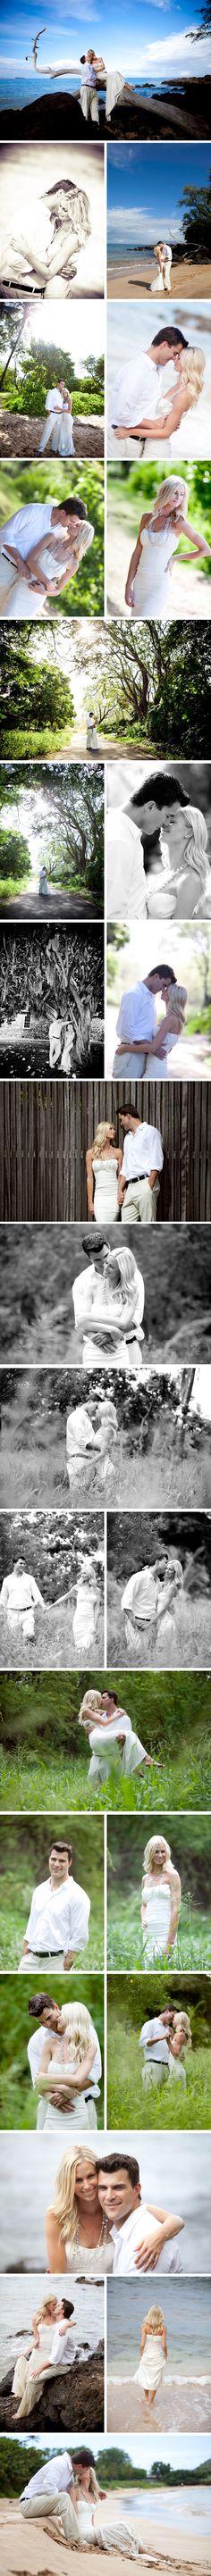 Maui Honeymoon Photography- honeymoon shoot is a must-have! Maui Honeymoon, Honeymoon Photography, George Strait, I Got Married, Pretty Pictures, Vacation Ideas, Wedding Pictures, Summer Beach, Wedding Stuff